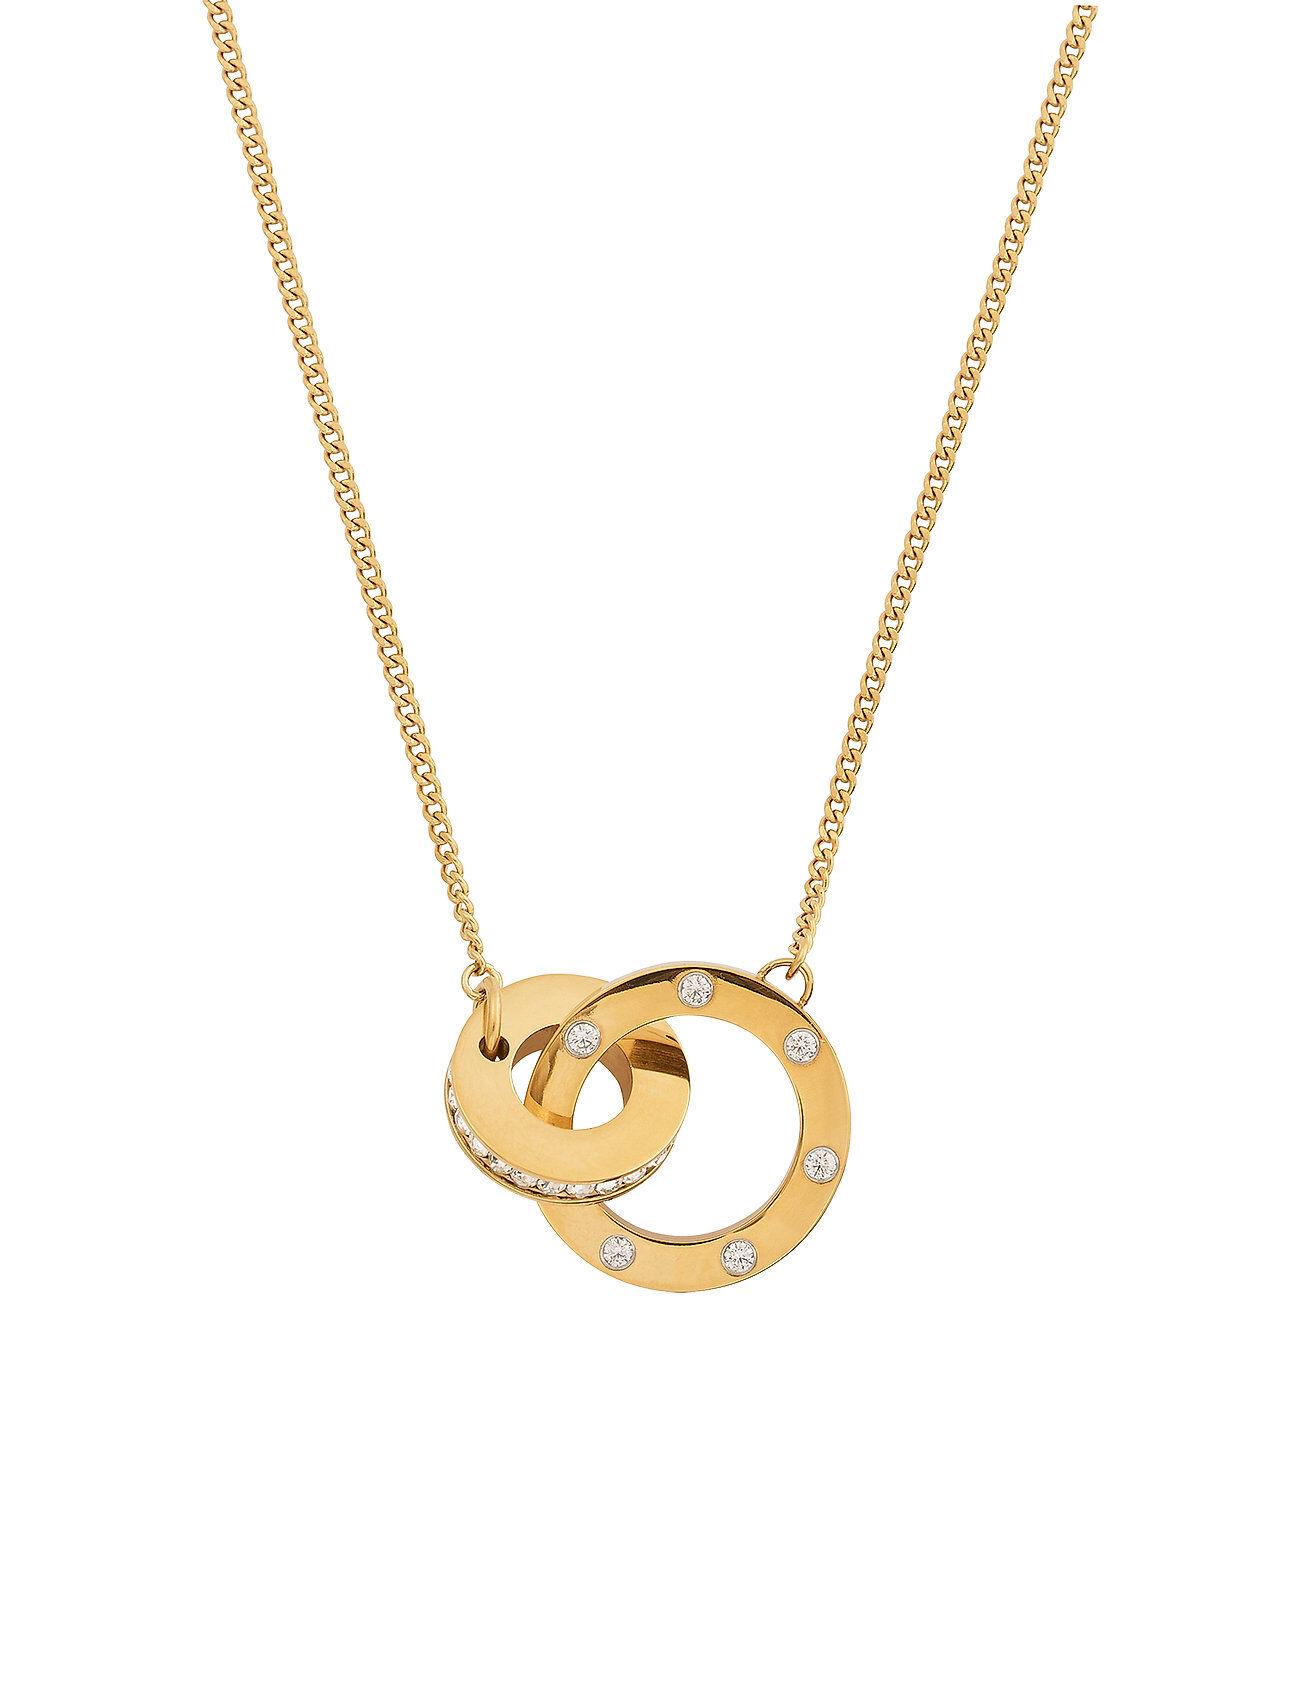 Edblad Ida Necklace Long Accessories Jewellery Necklaces Dainty Necklaces Kulta Edblad